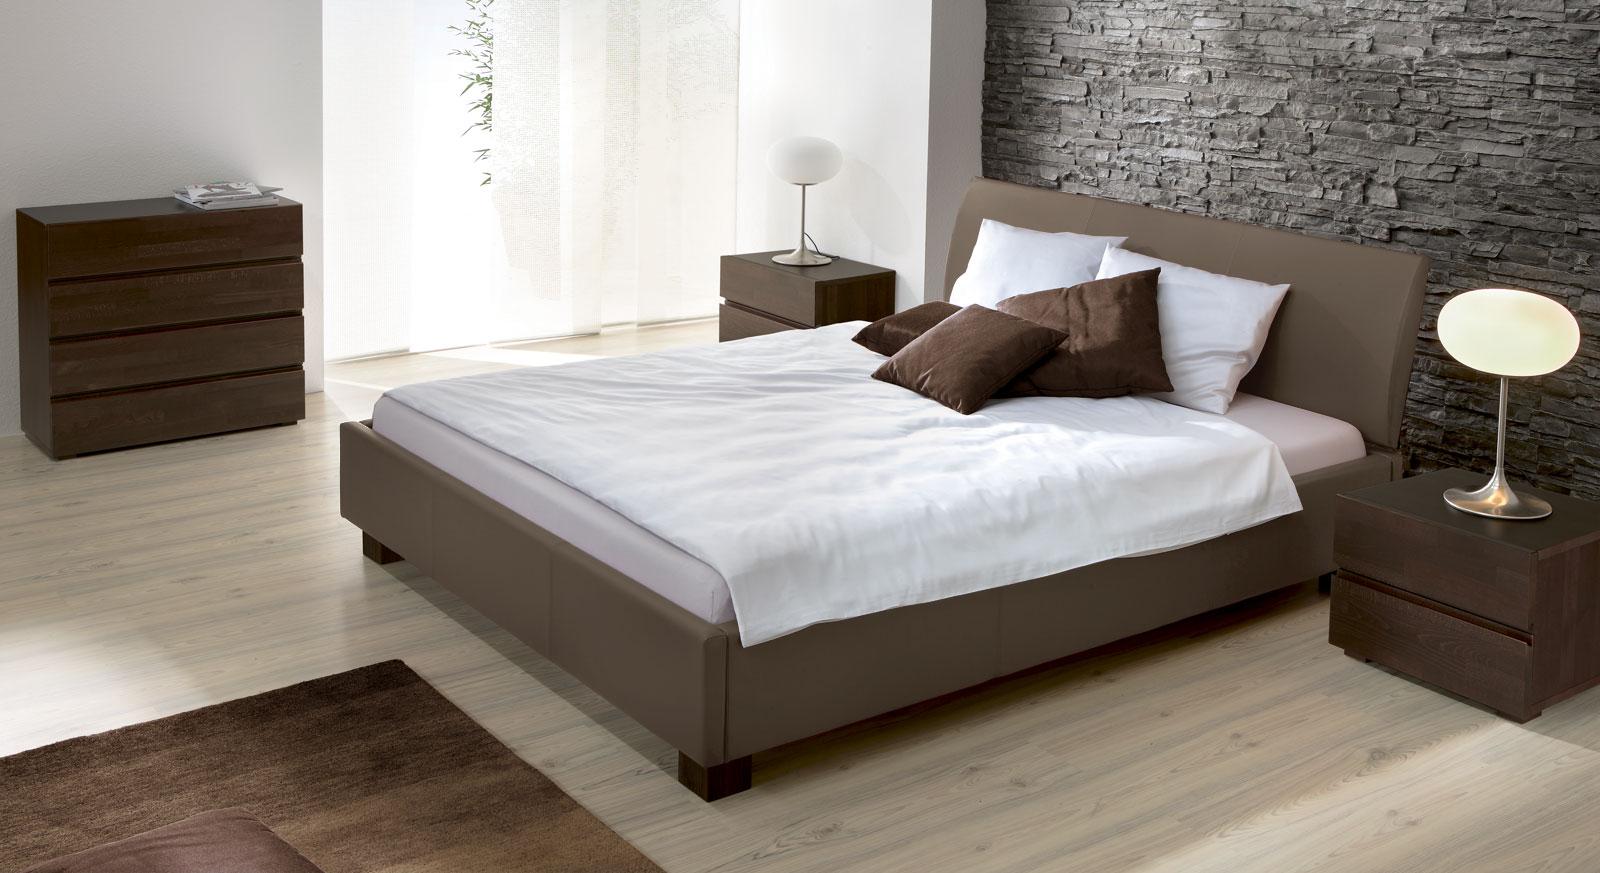 bett mit hohem kopfteil affordable bett absolutely ideas. Black Bedroom Furniture Sets. Home Design Ideas